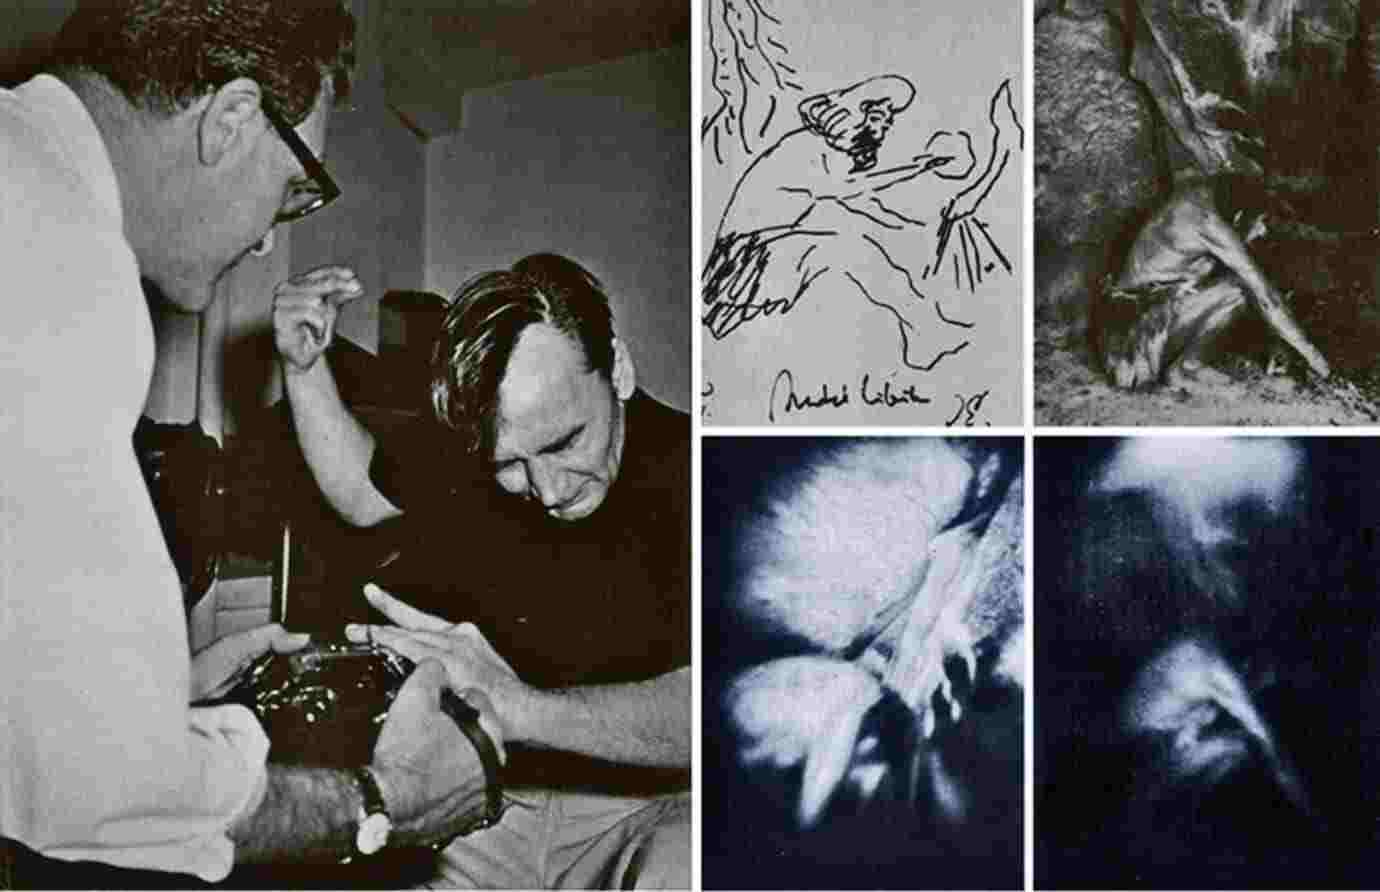 Ted serios 1968 fotografie paranormala omul din neandertal